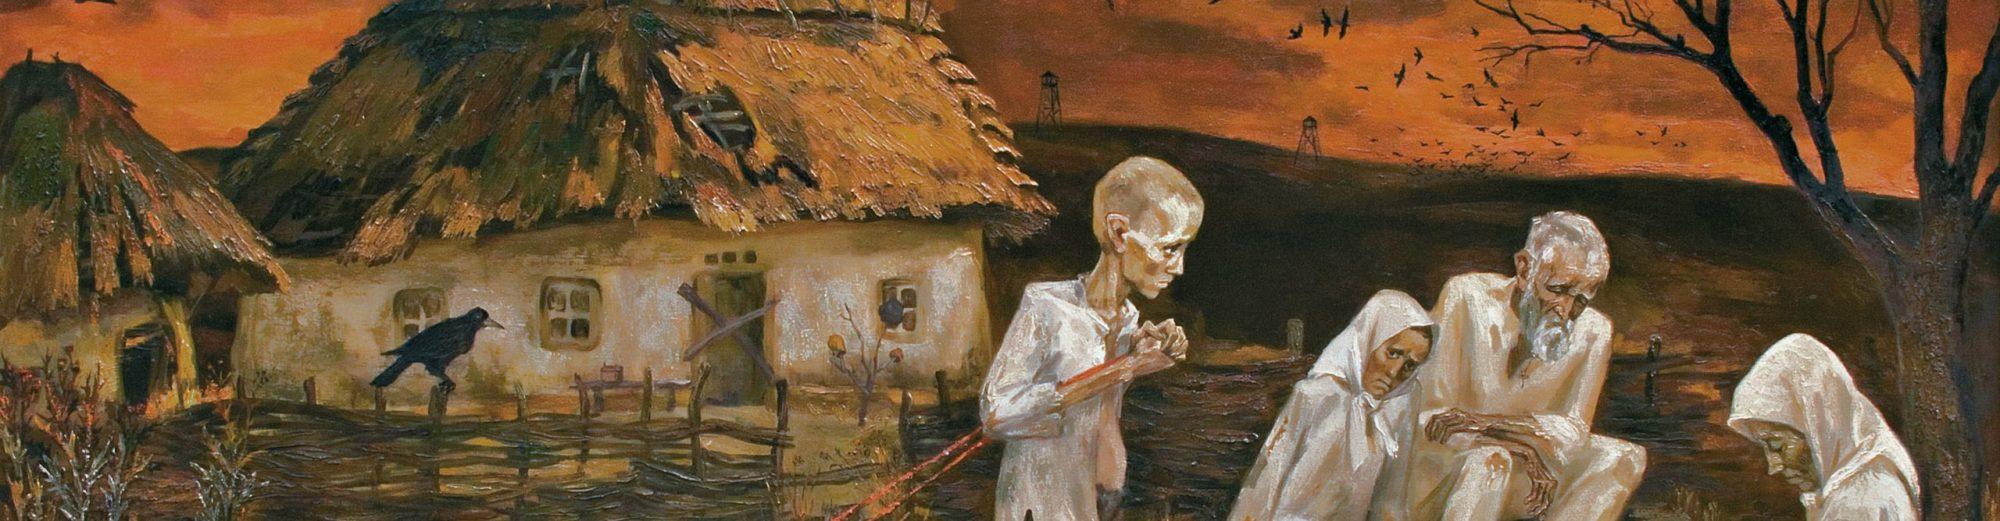 dlasarte   –  History 2203 – Imagining Disaster